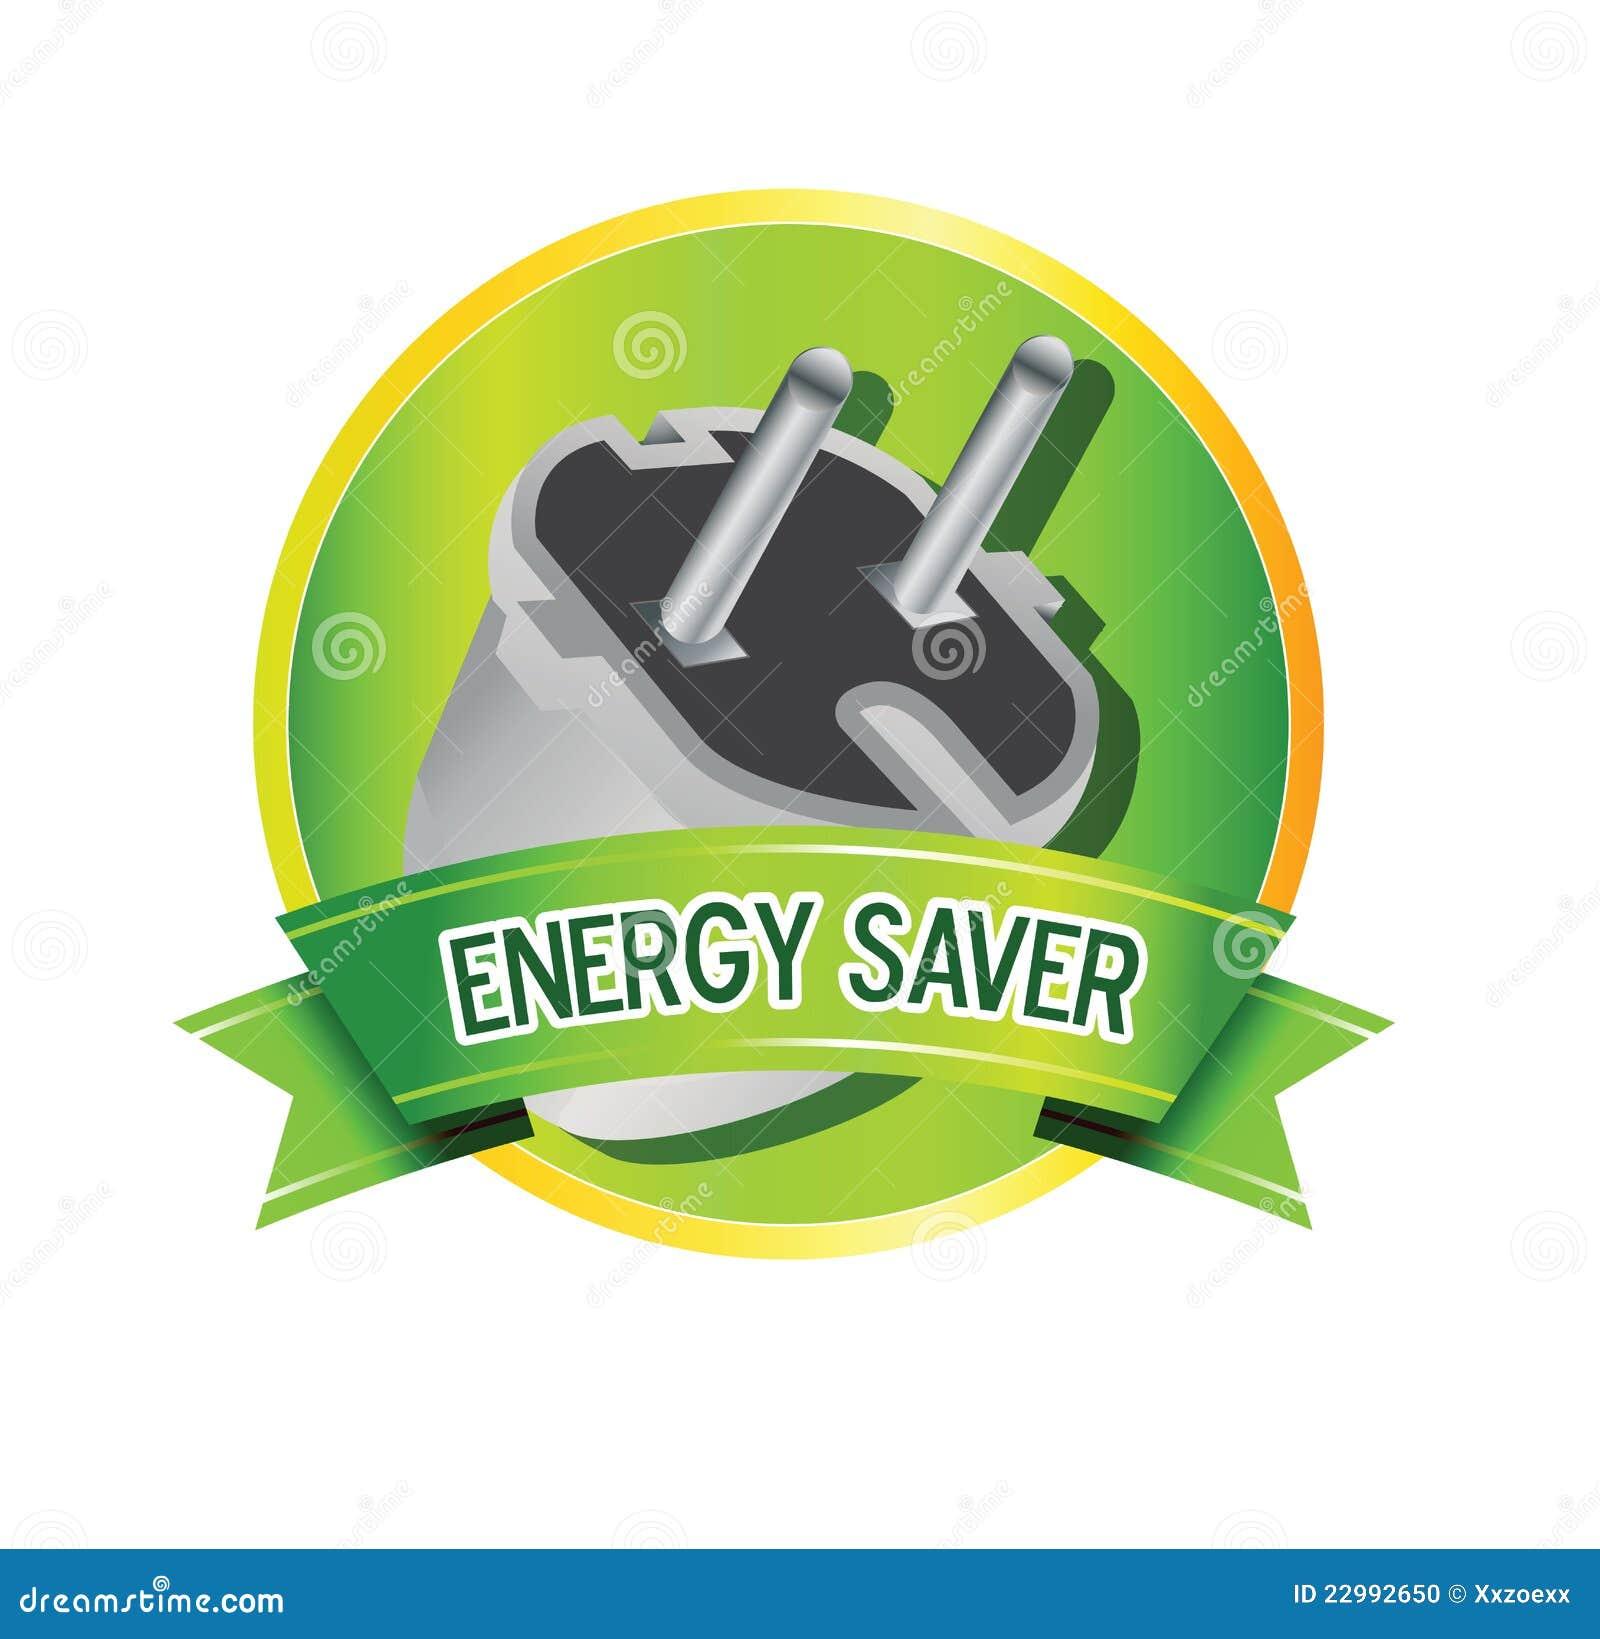 Energy Saver Item Seal Stock Photo - Image: 22992650